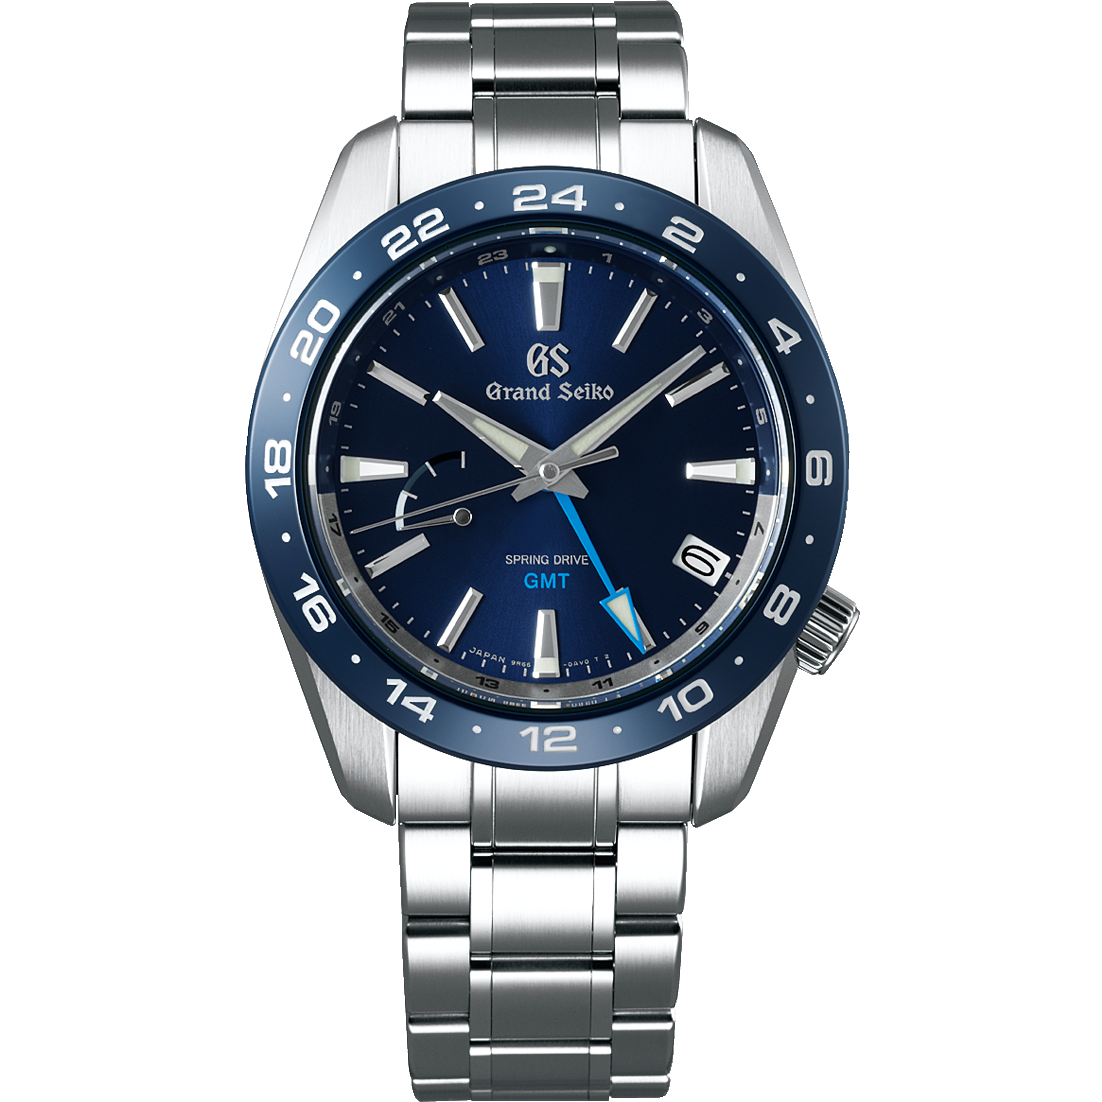 Grand Seiko SBGE253, SBGE257 SBGE255 GMT price review 2020